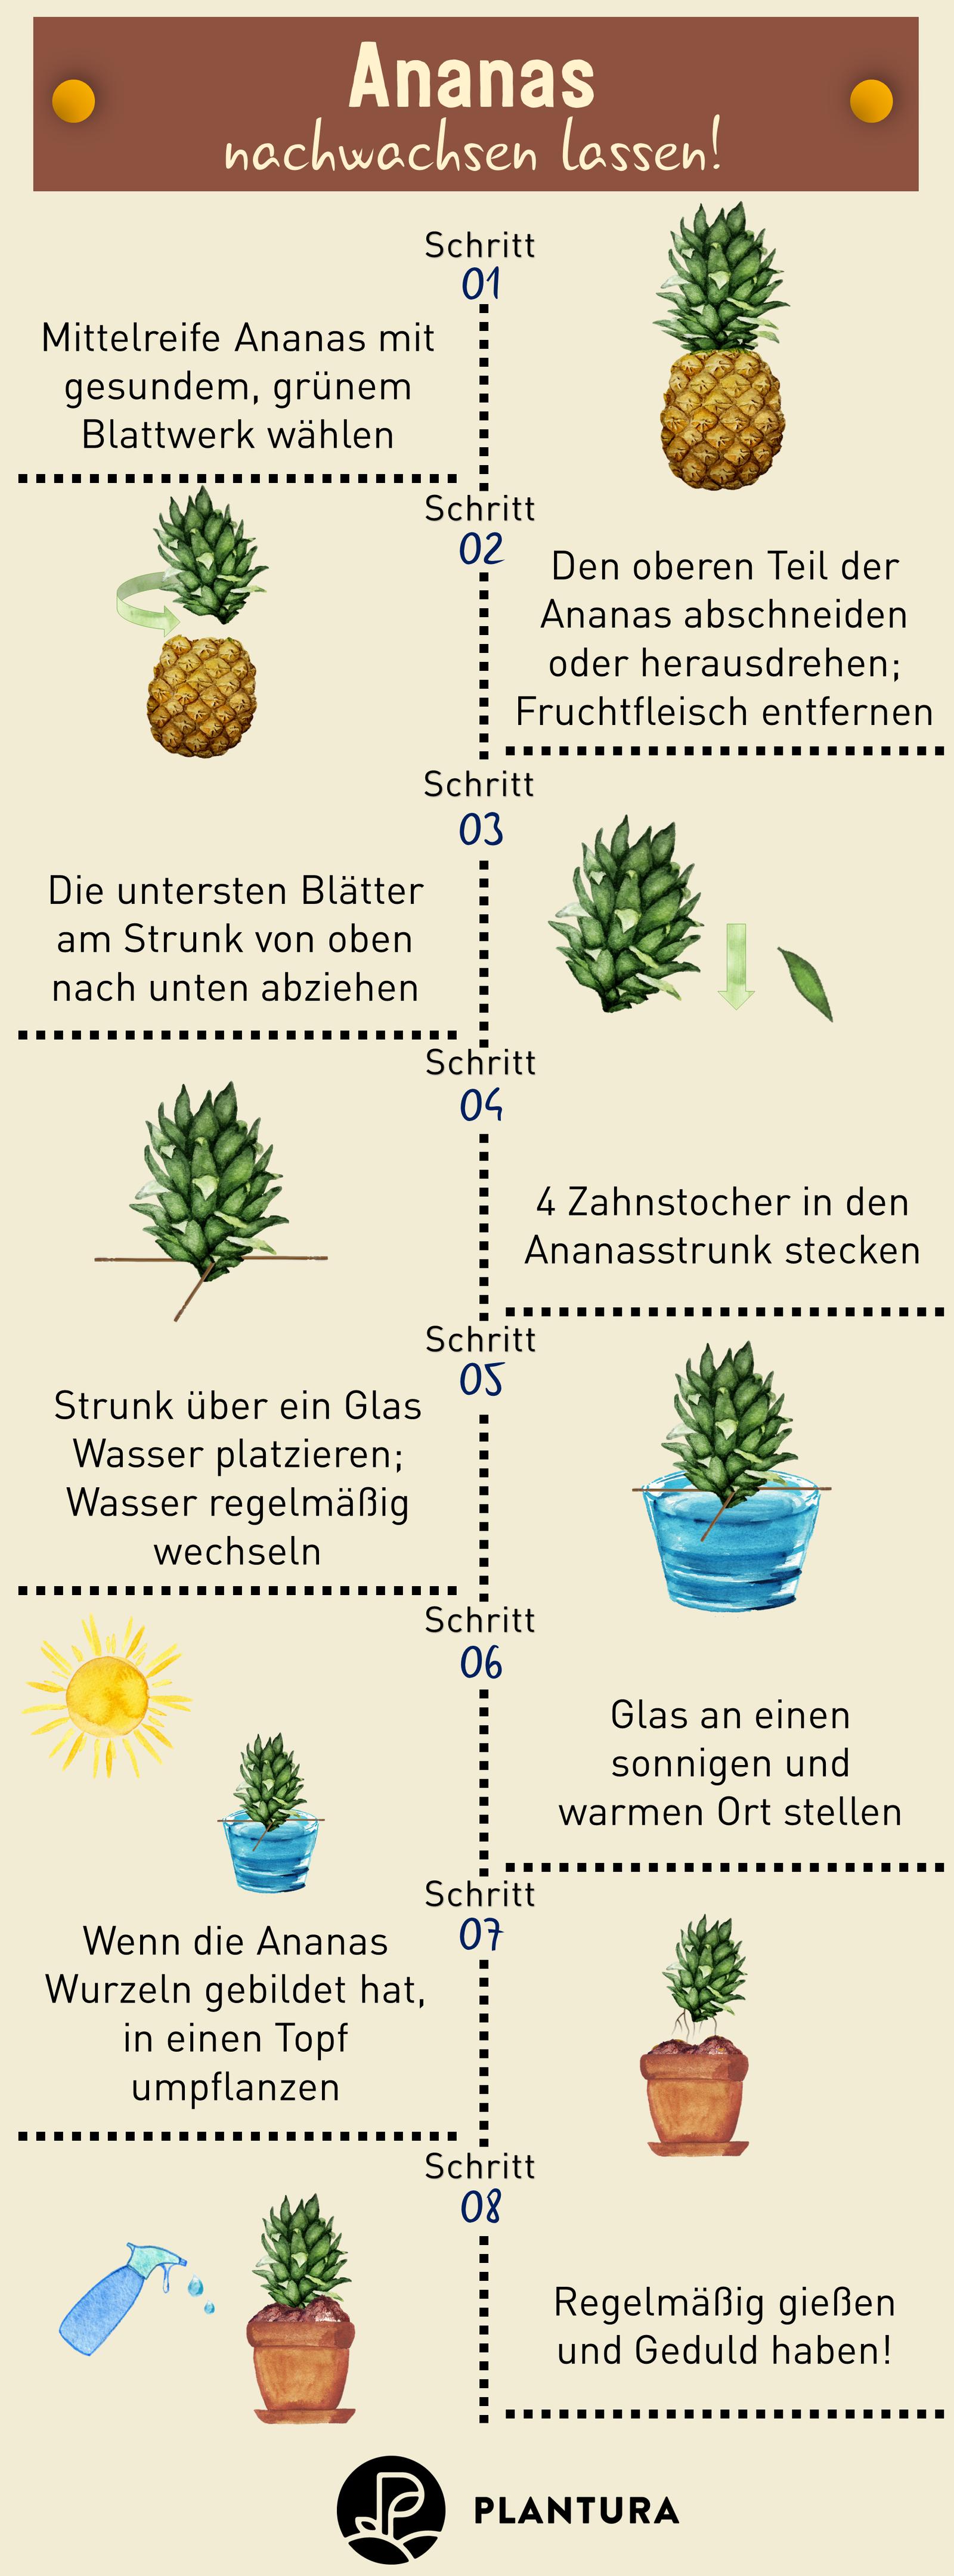 8 Gemüse wiederverwenden Ideen   pflanzen, gemüse, kräuter anpflanzen